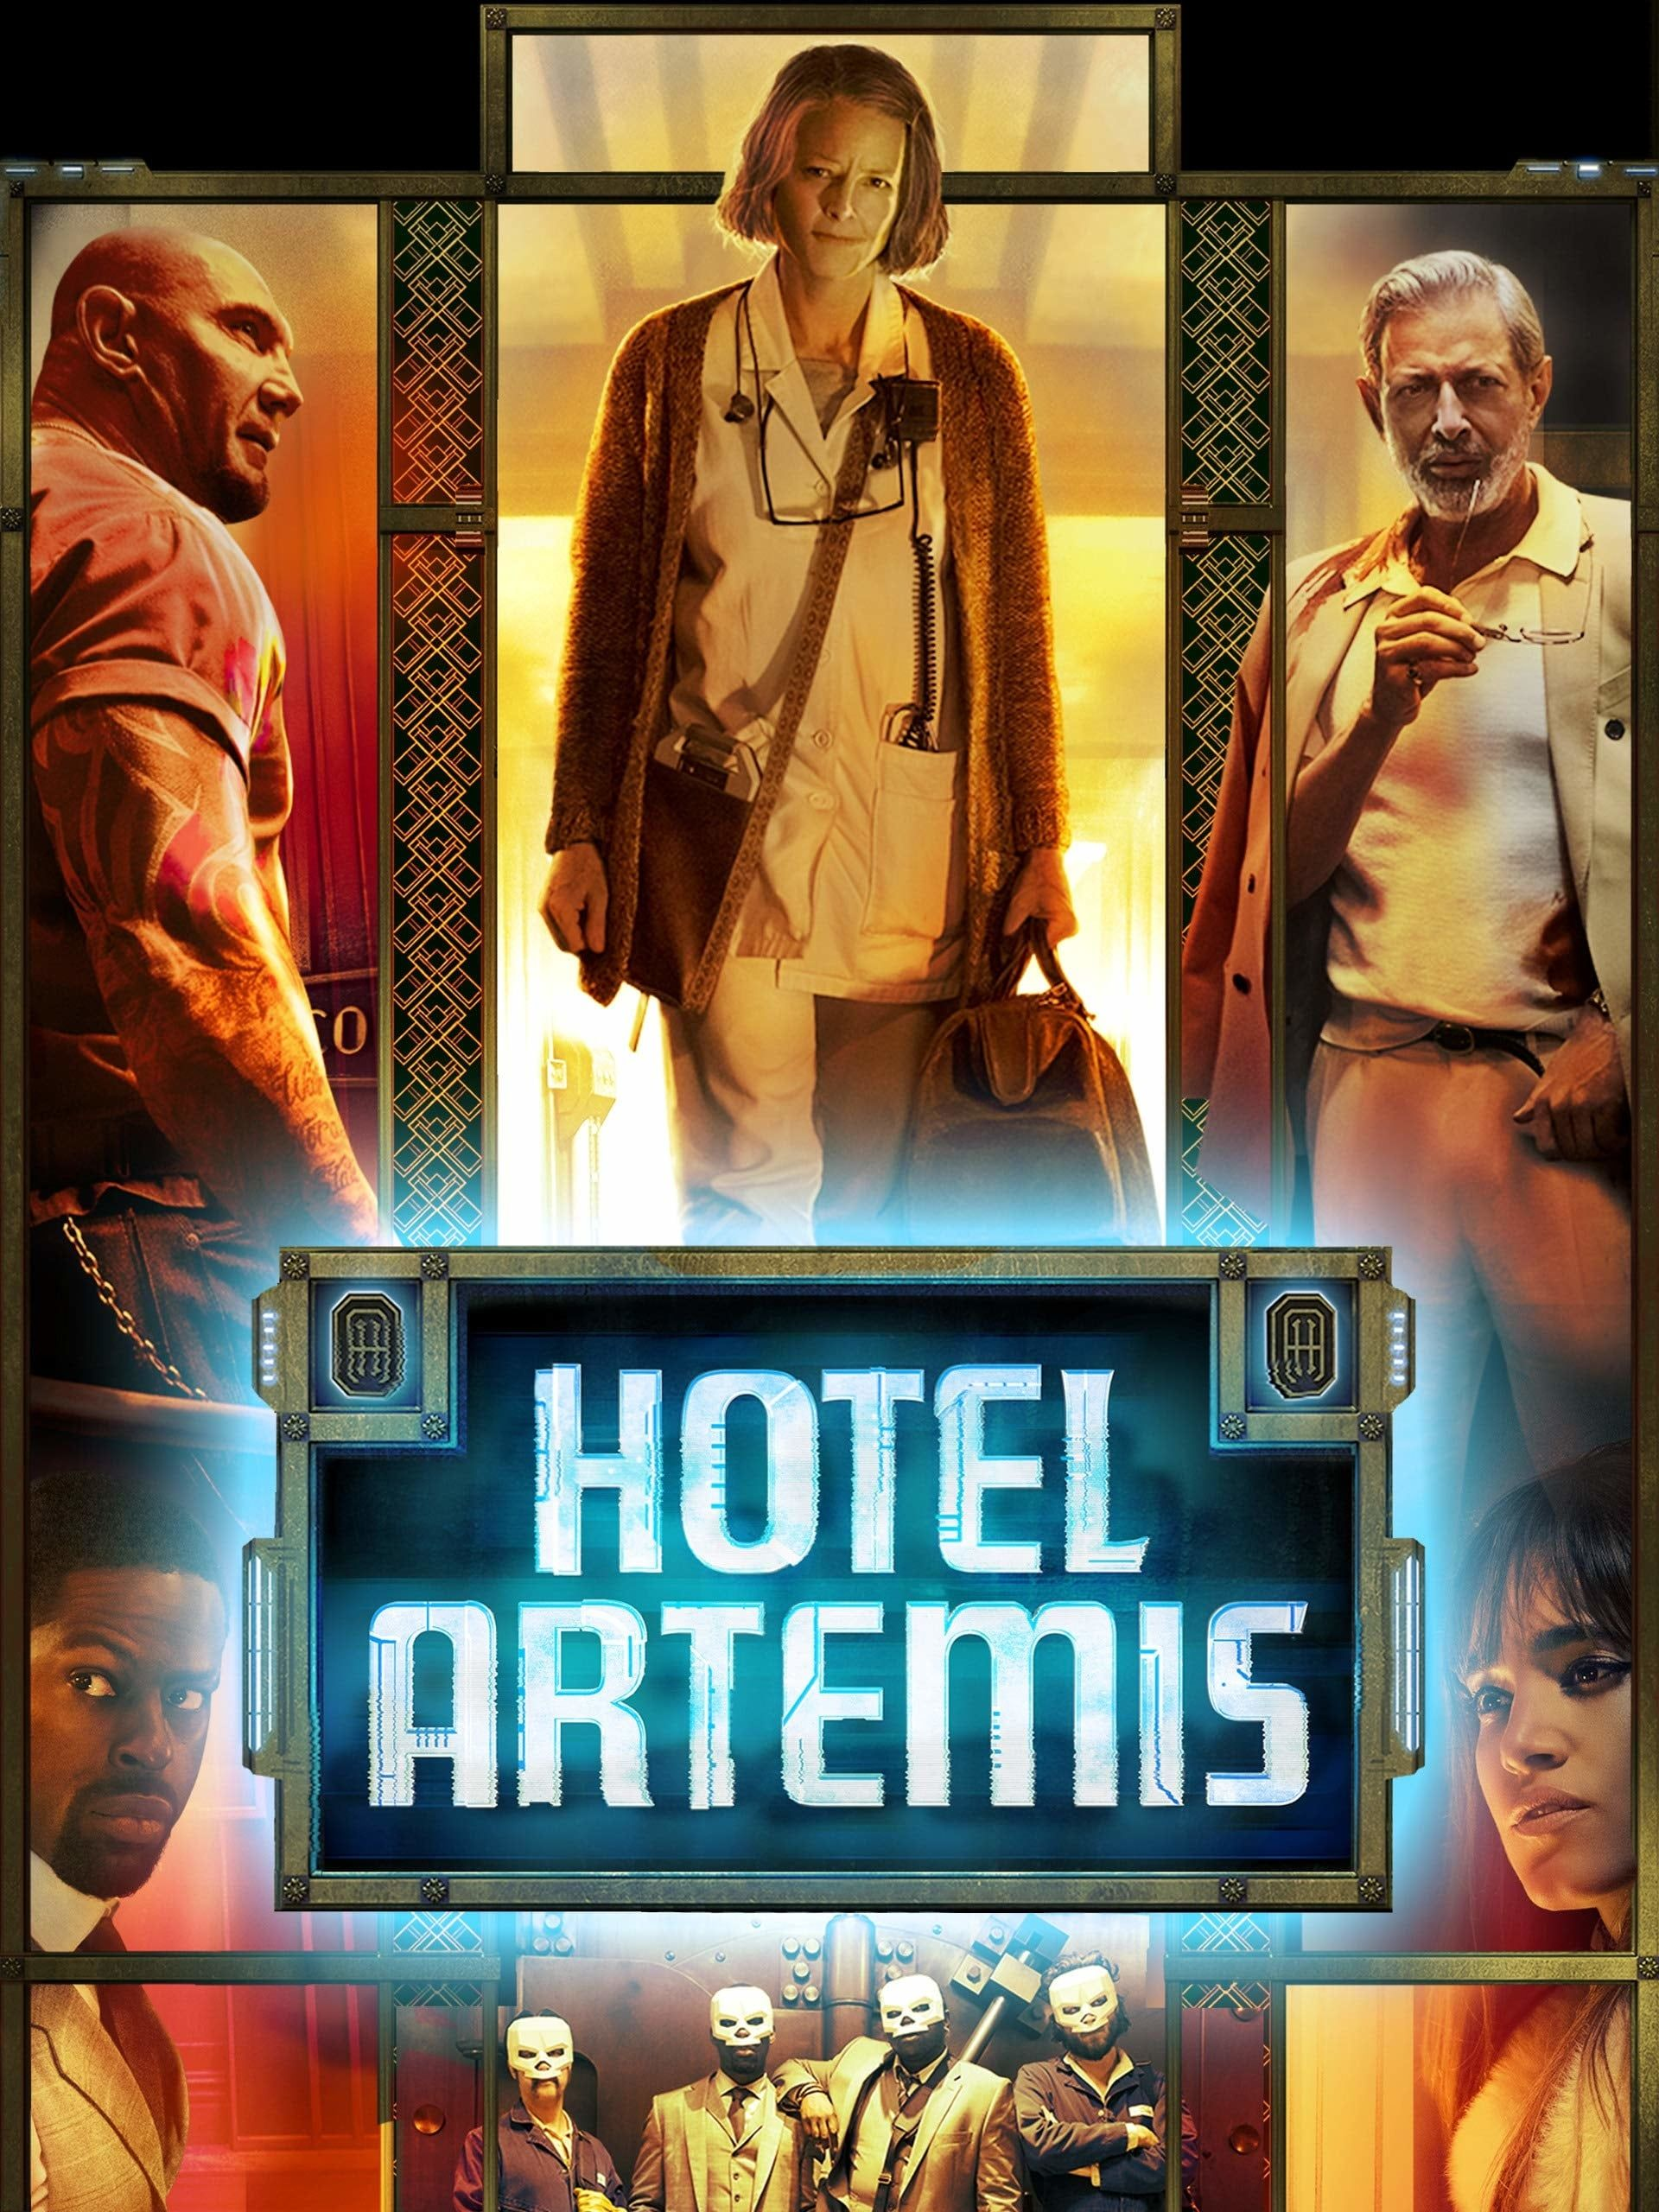 Hotel Artemis Pelicula Completa 2018 Espanol Latino Gratis En